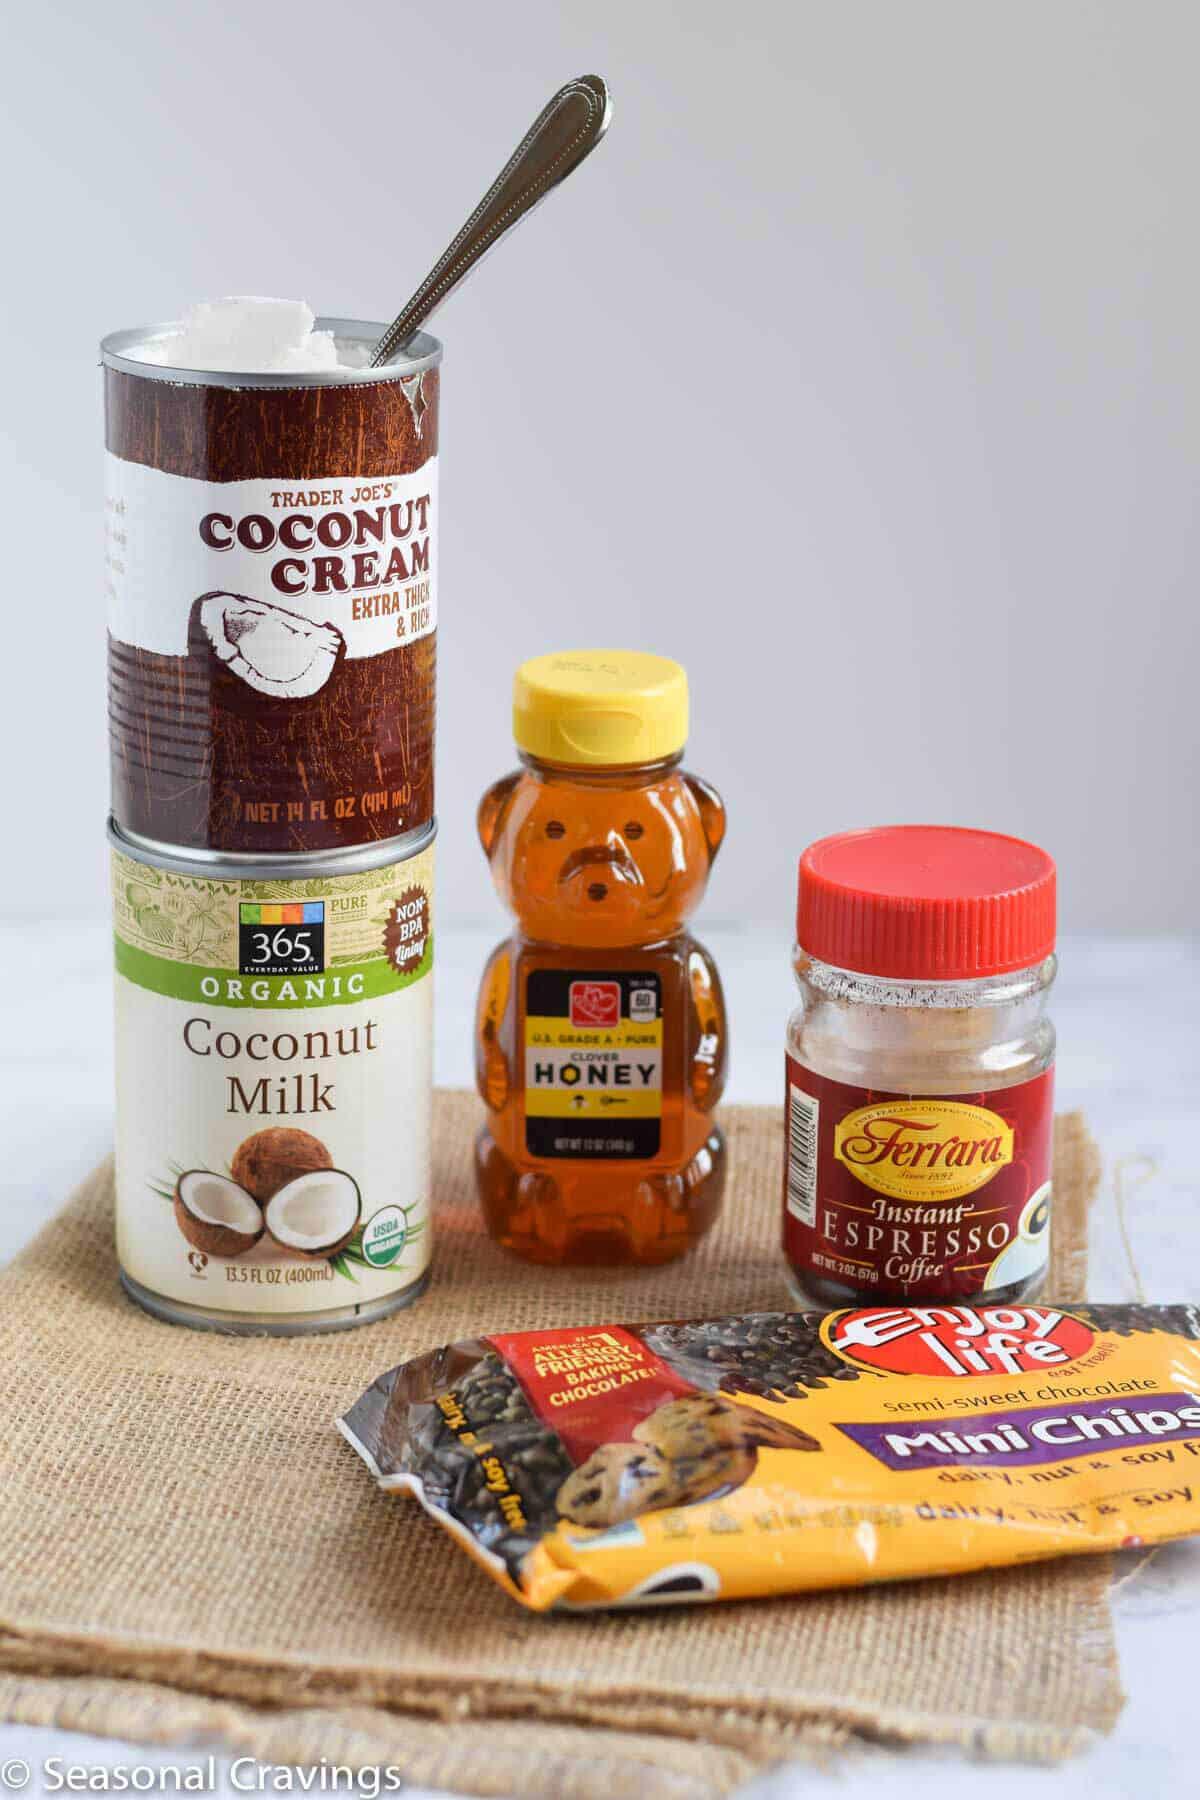 Coconut Espresso Chocolate Chip Ice Cream ingredients